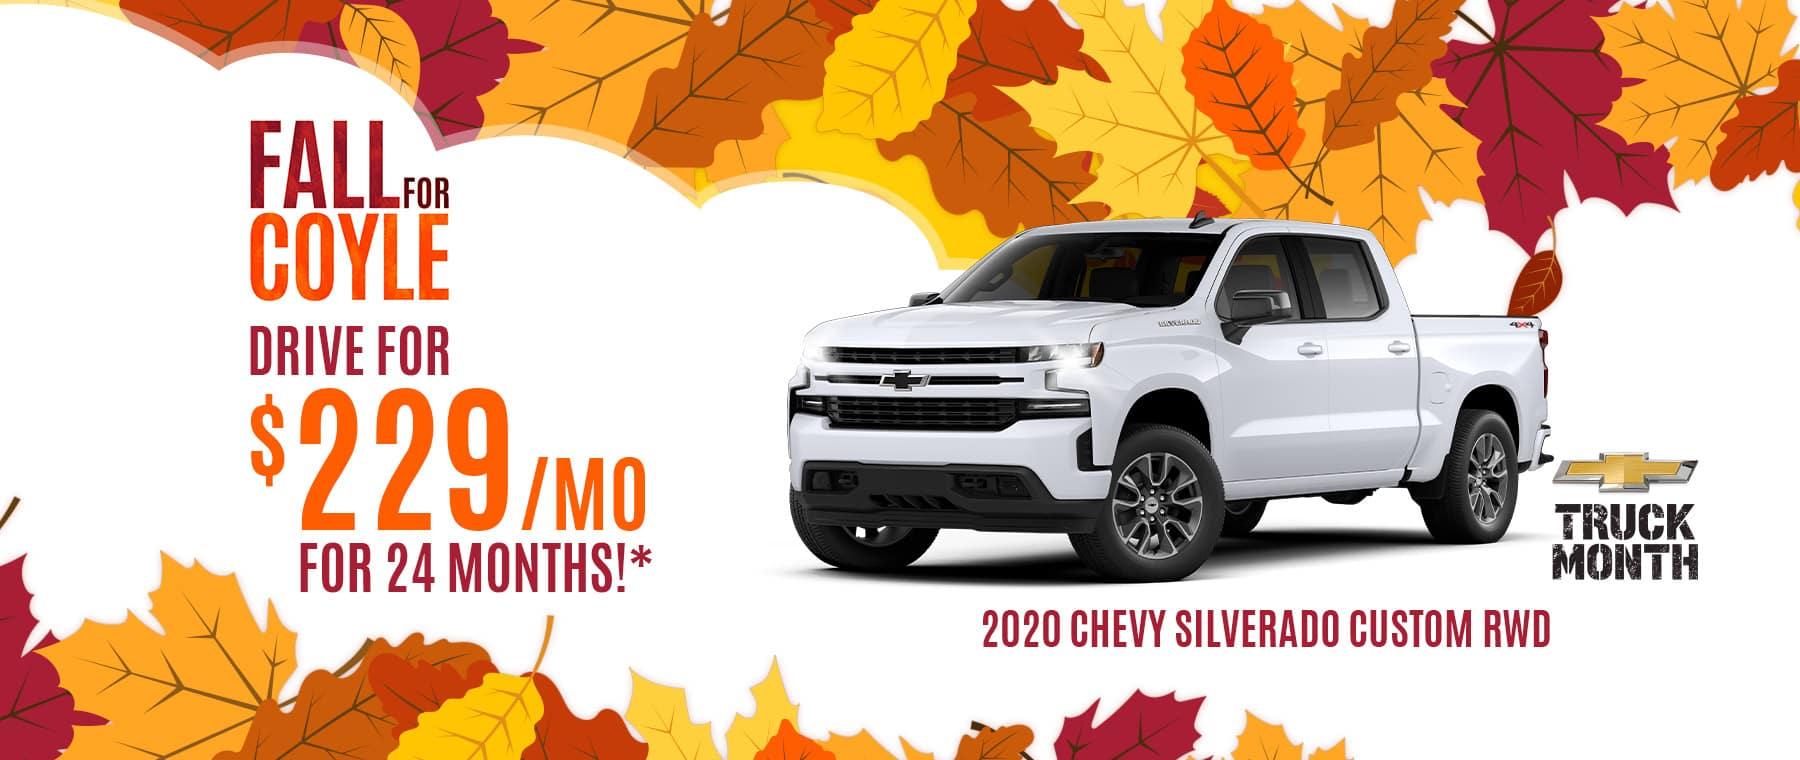 Save on a new Chevy Silverado near Sellersburg, Indiana